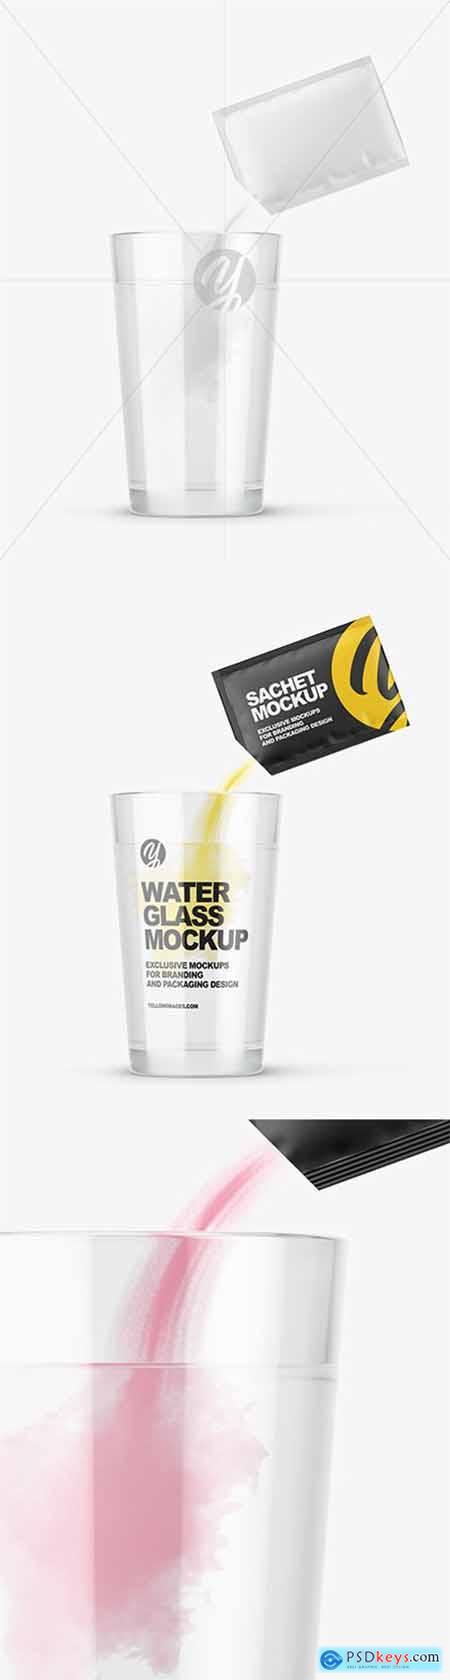 Sachet With Powder & Water Glass Mockup